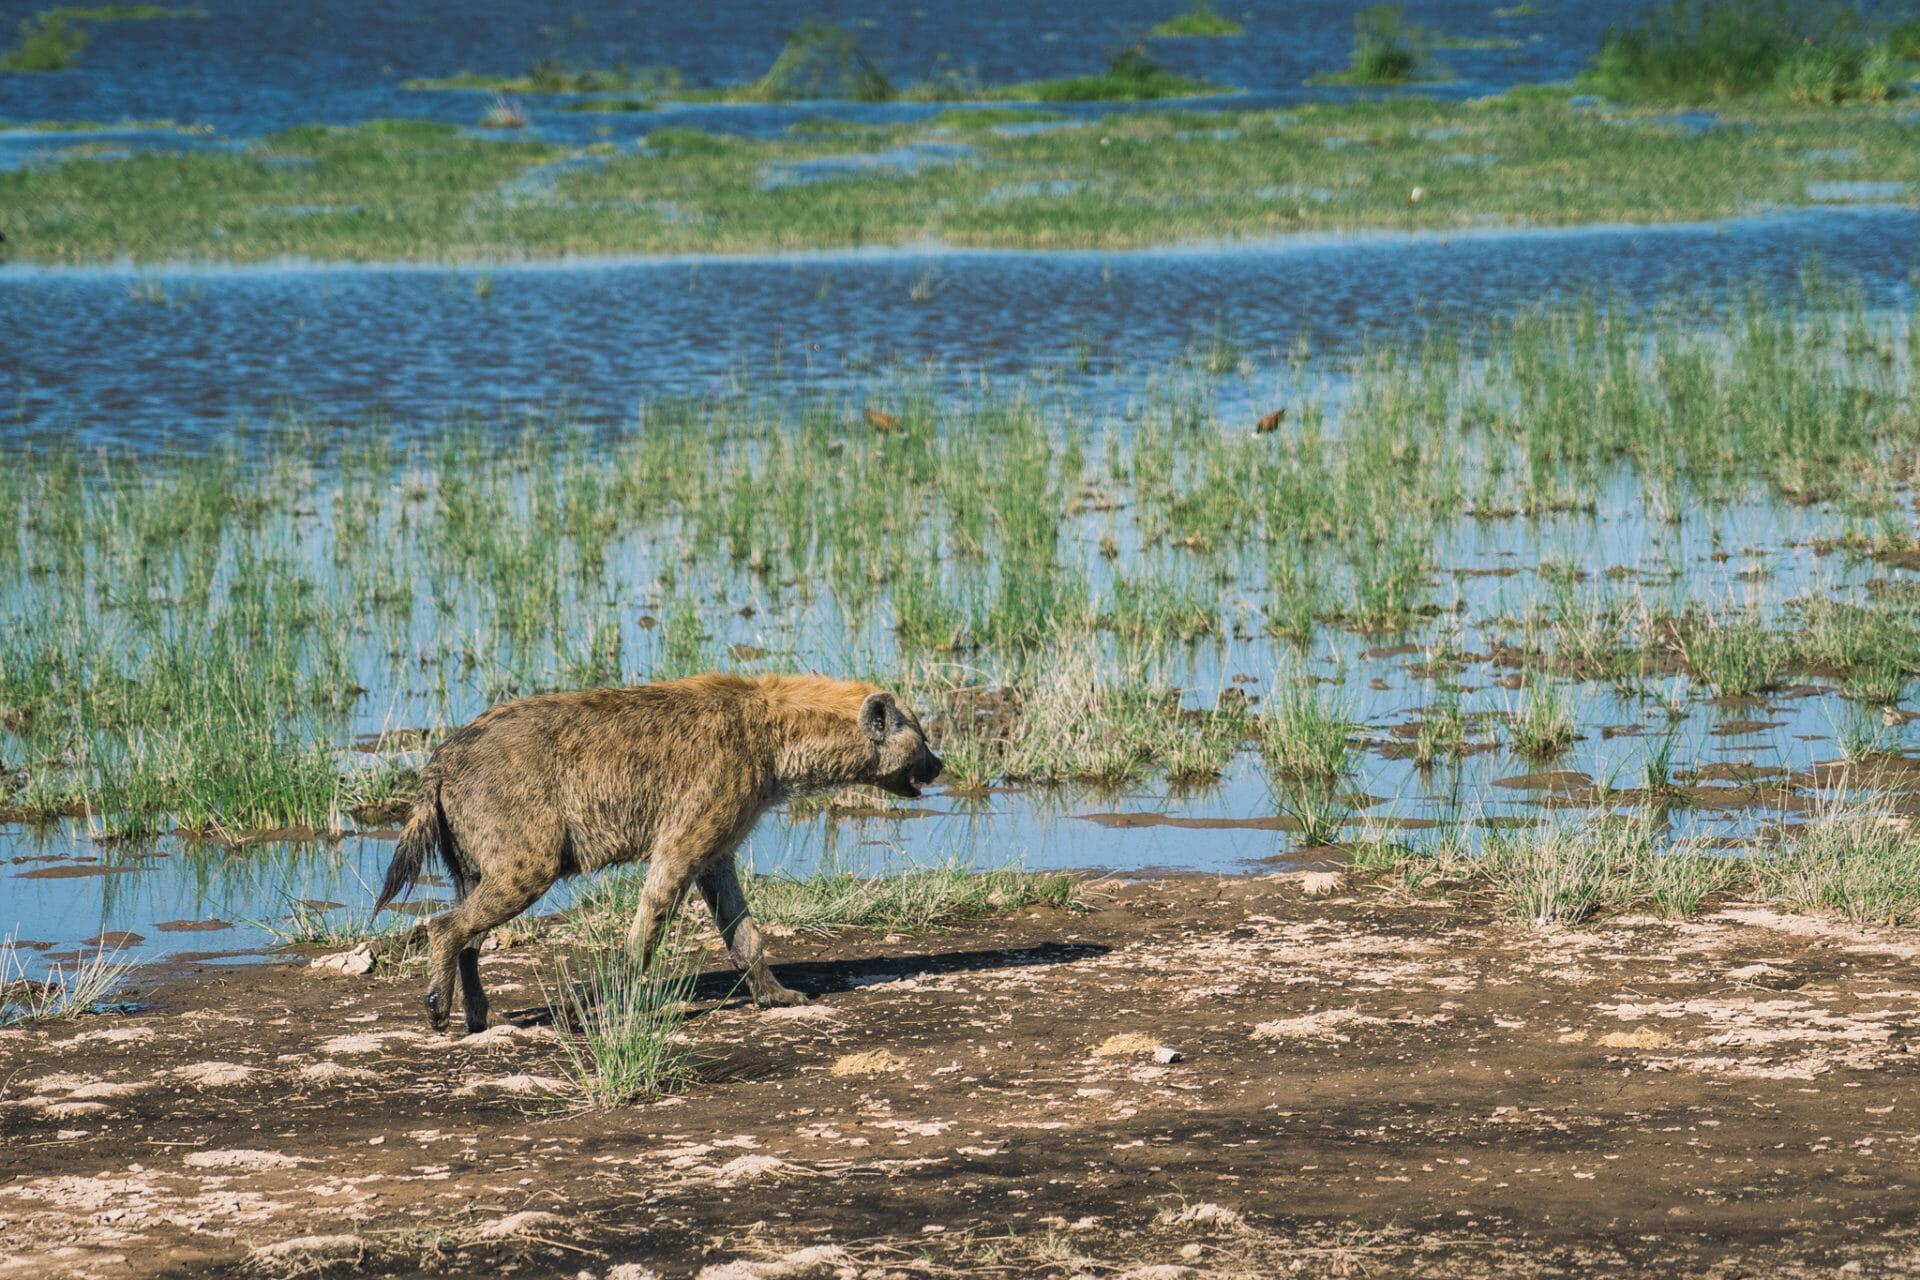 parc-amboseli-kenya-hyene-safari